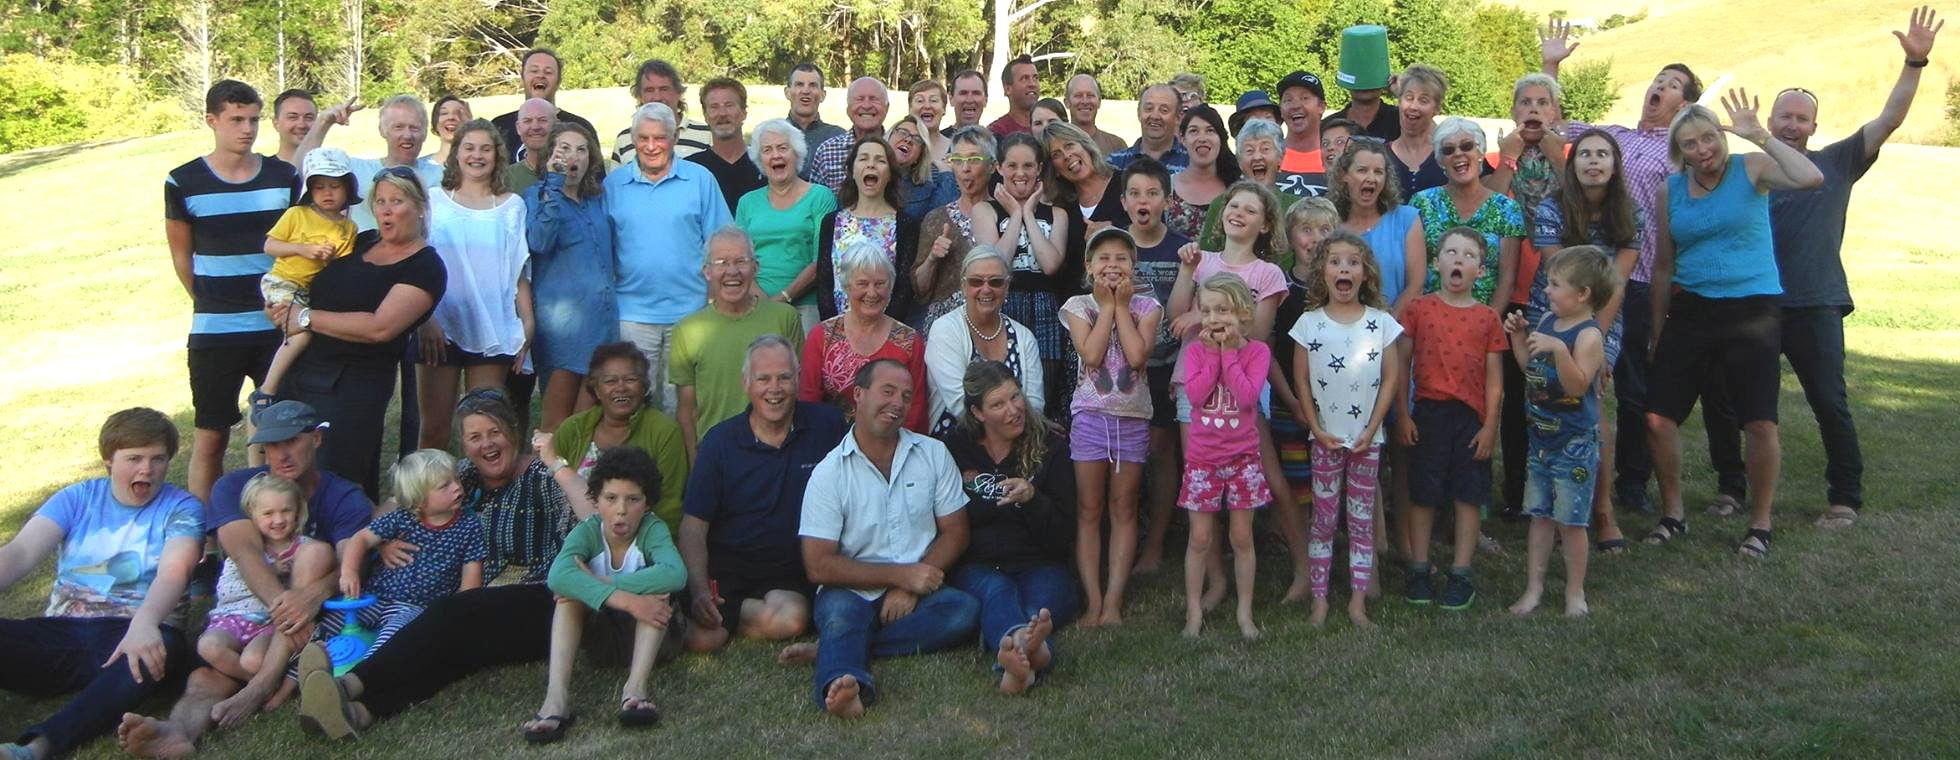 family-reunion-2016-crop-edit